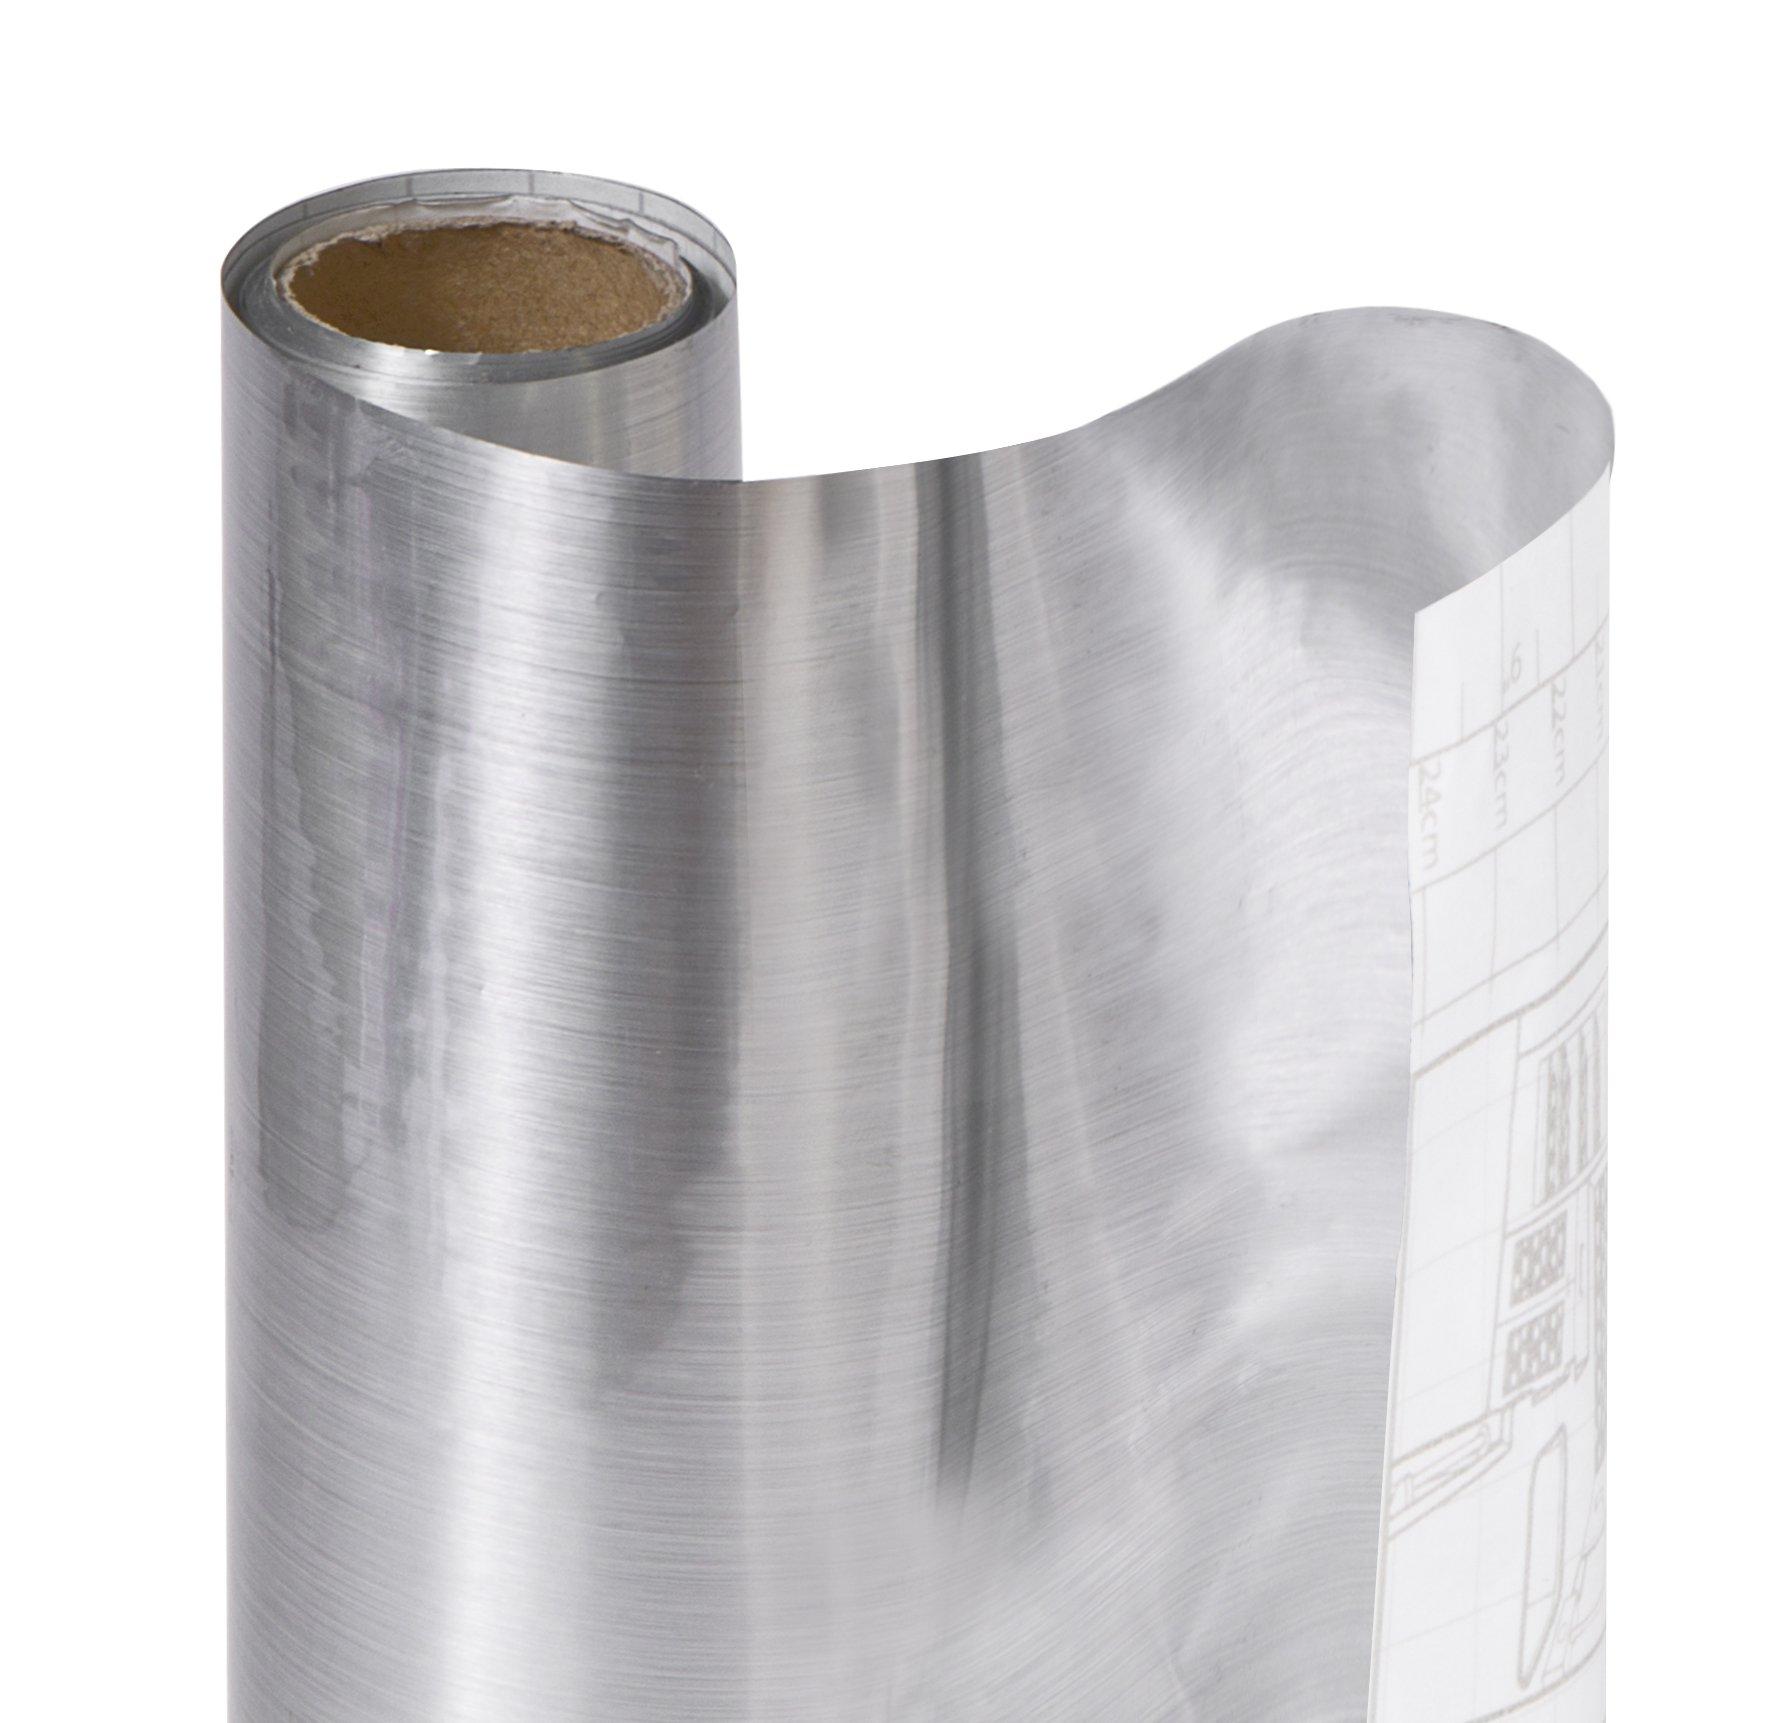 DAZZ 8631071 Stainless Steel Adhesive Metallic Shelf Liner